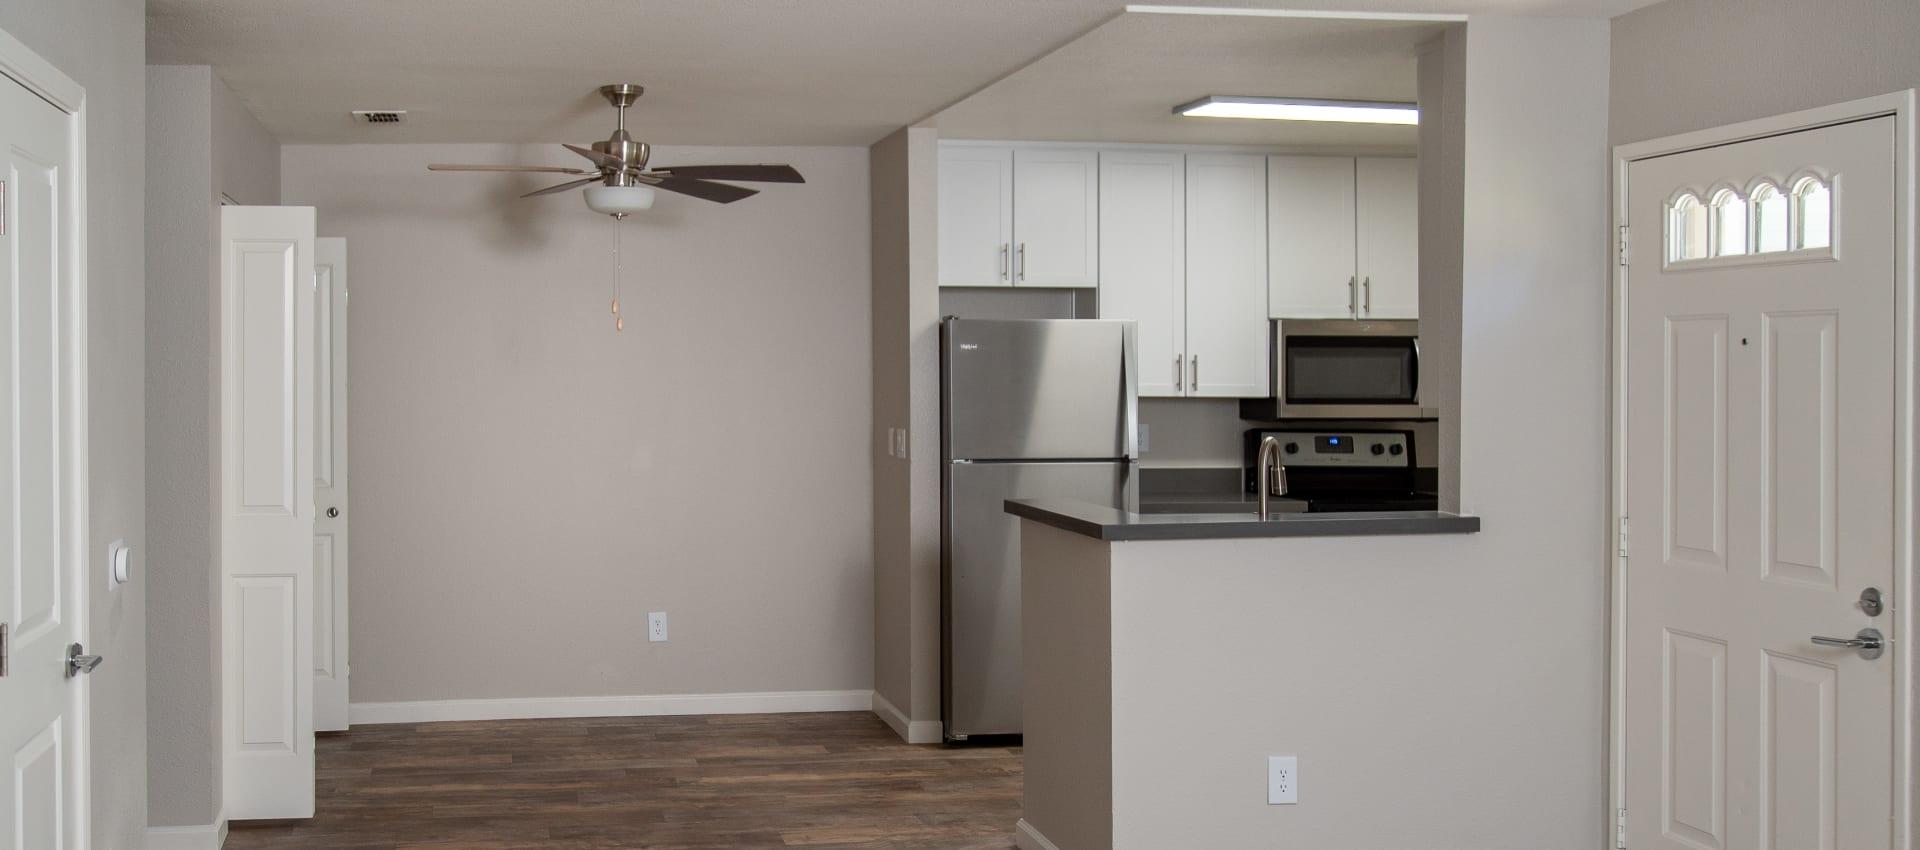 View of kitchen at Shaliko in Rocklin, CA